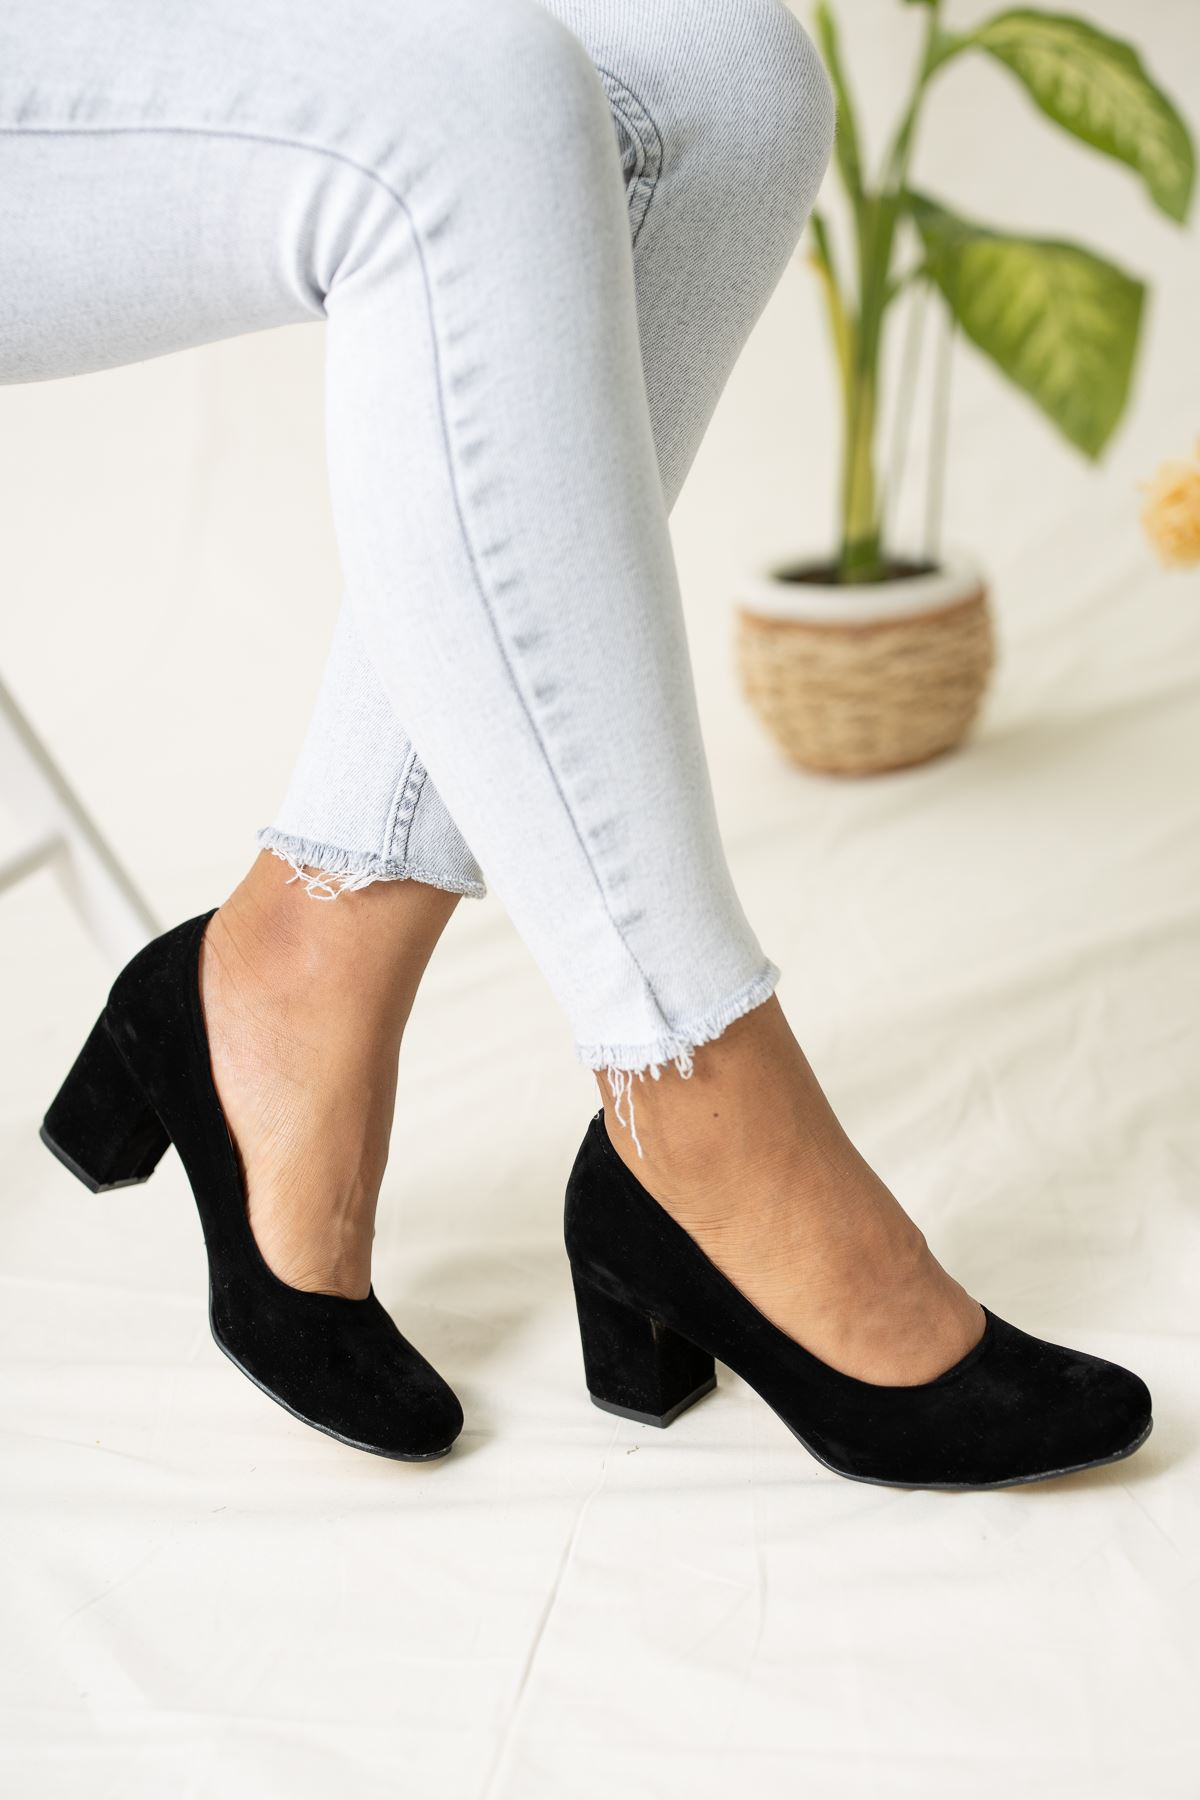 Kare Topuk Siyah Süet Kadın Ayakkabı